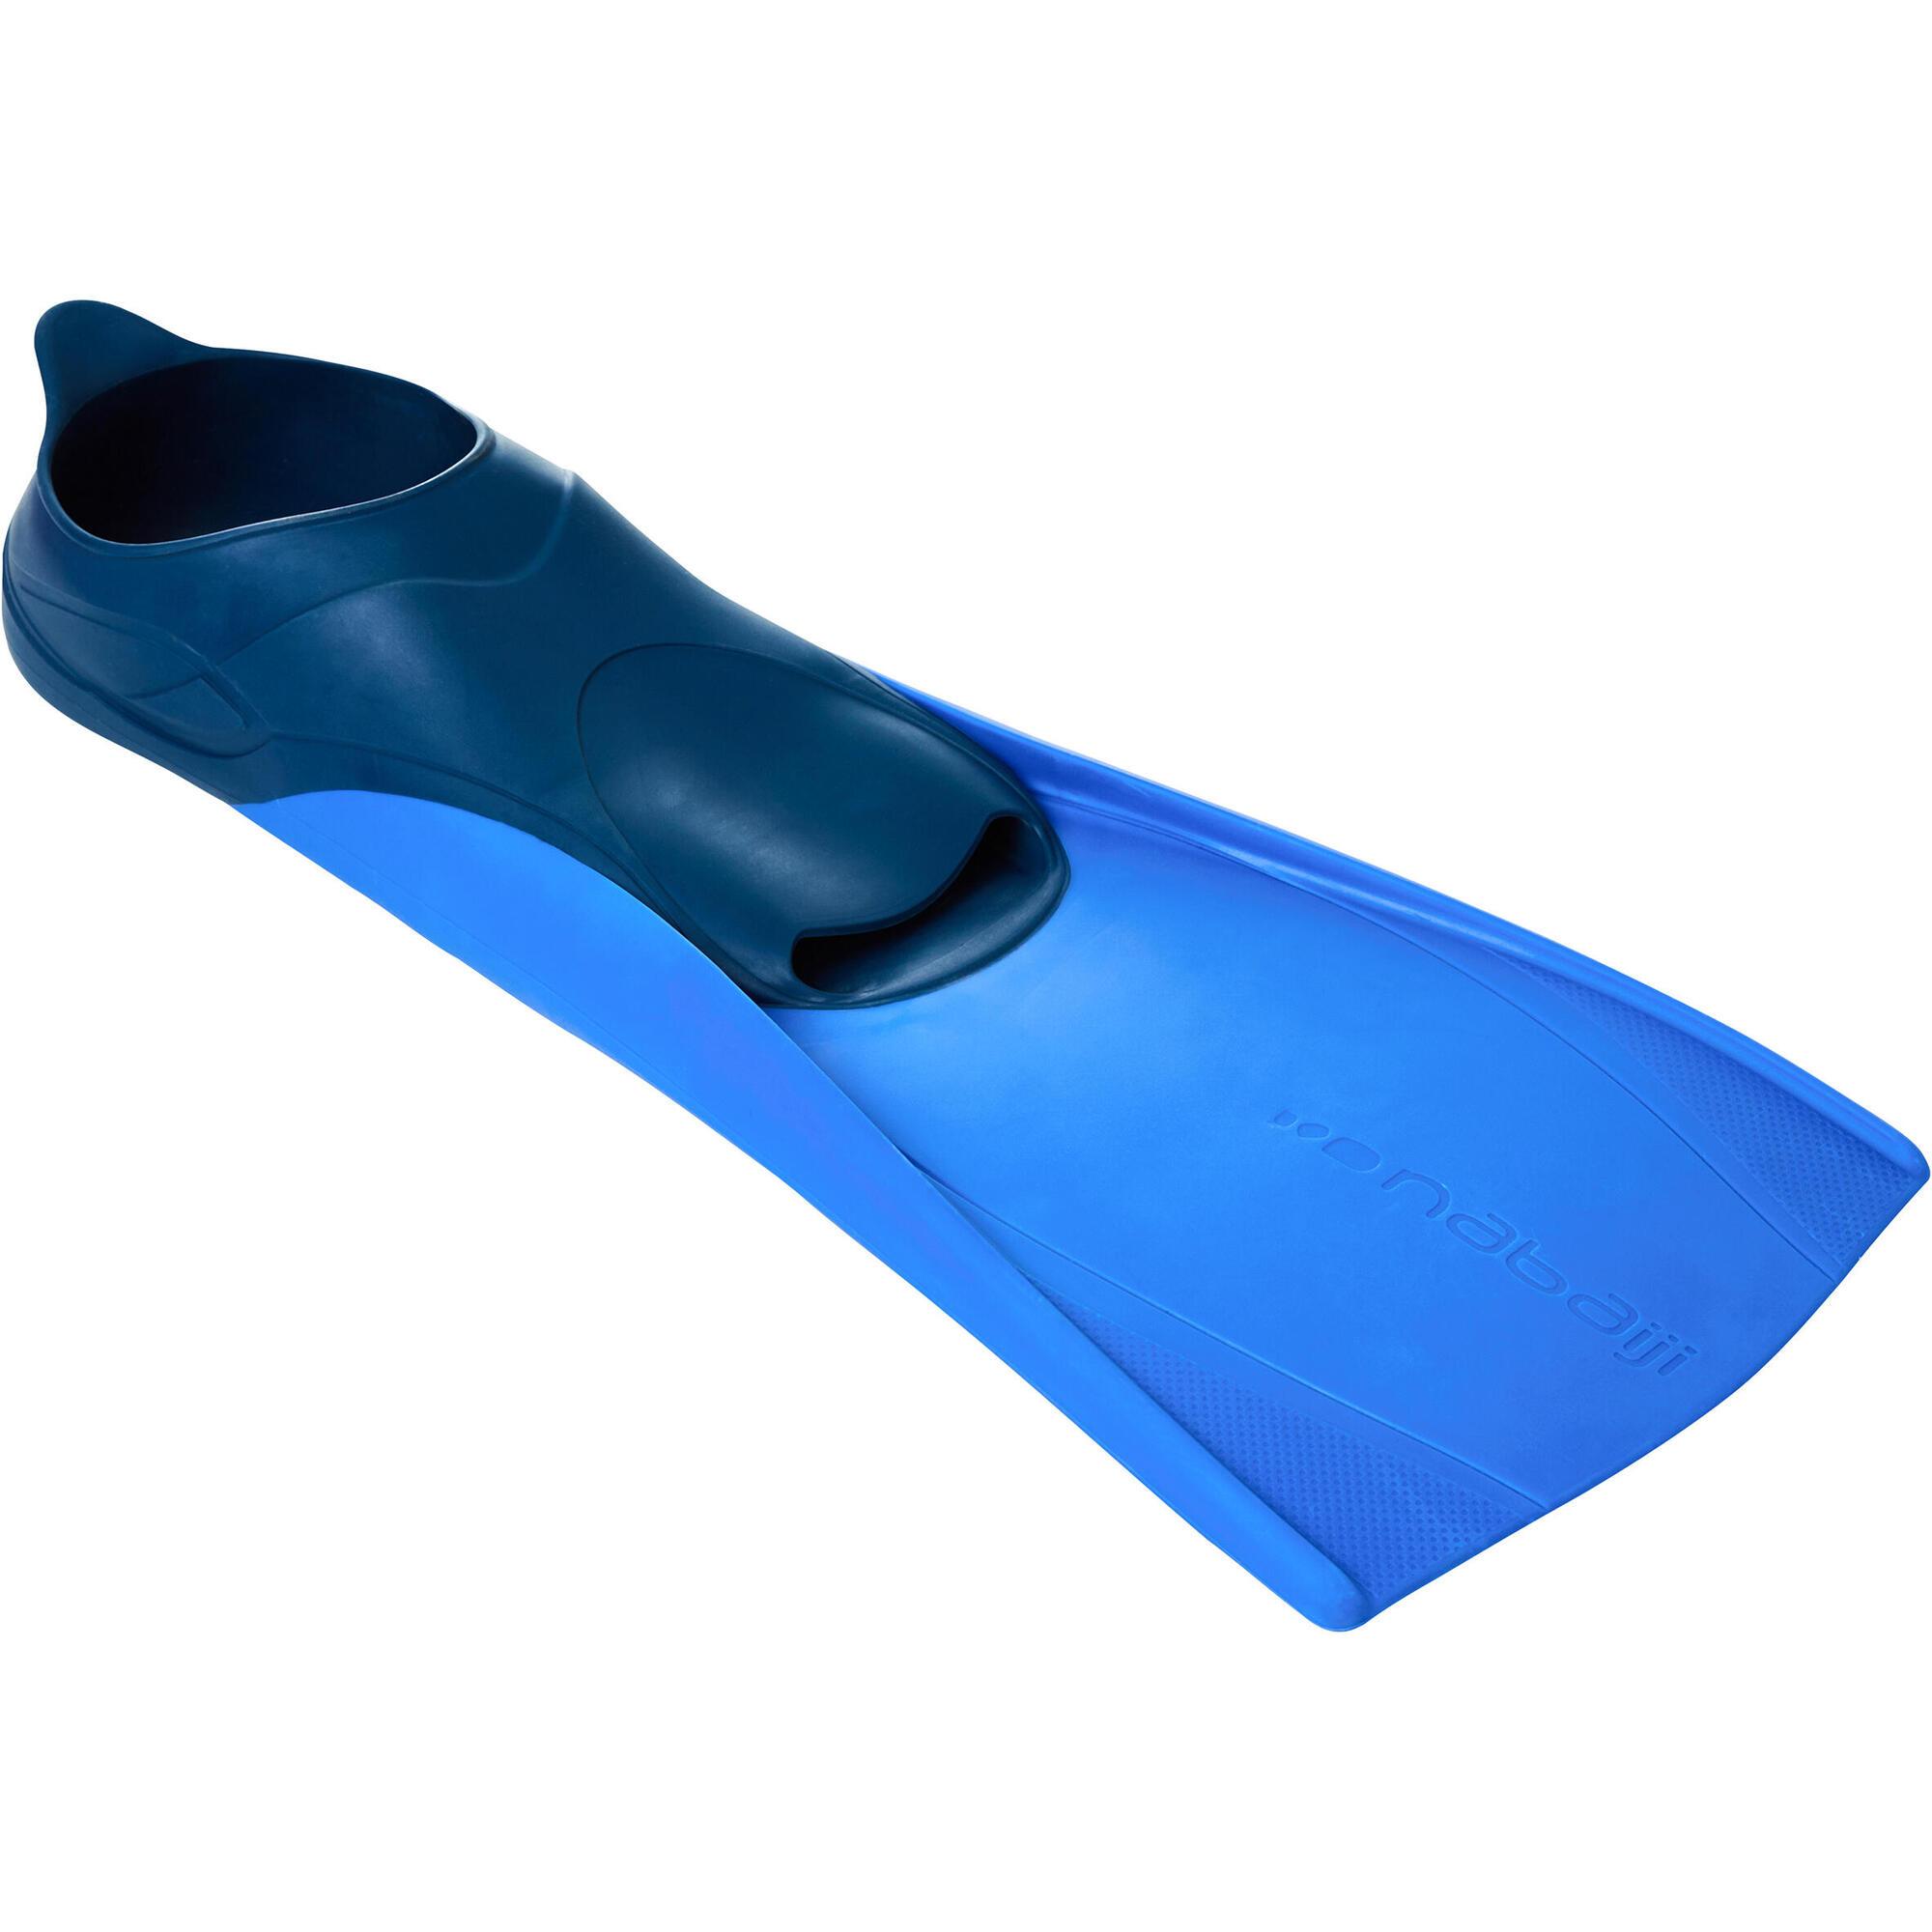 palmes natation longues trainfins bleu fonce bleu nabaiji. Black Bedroom Furniture Sets. Home Design Ideas